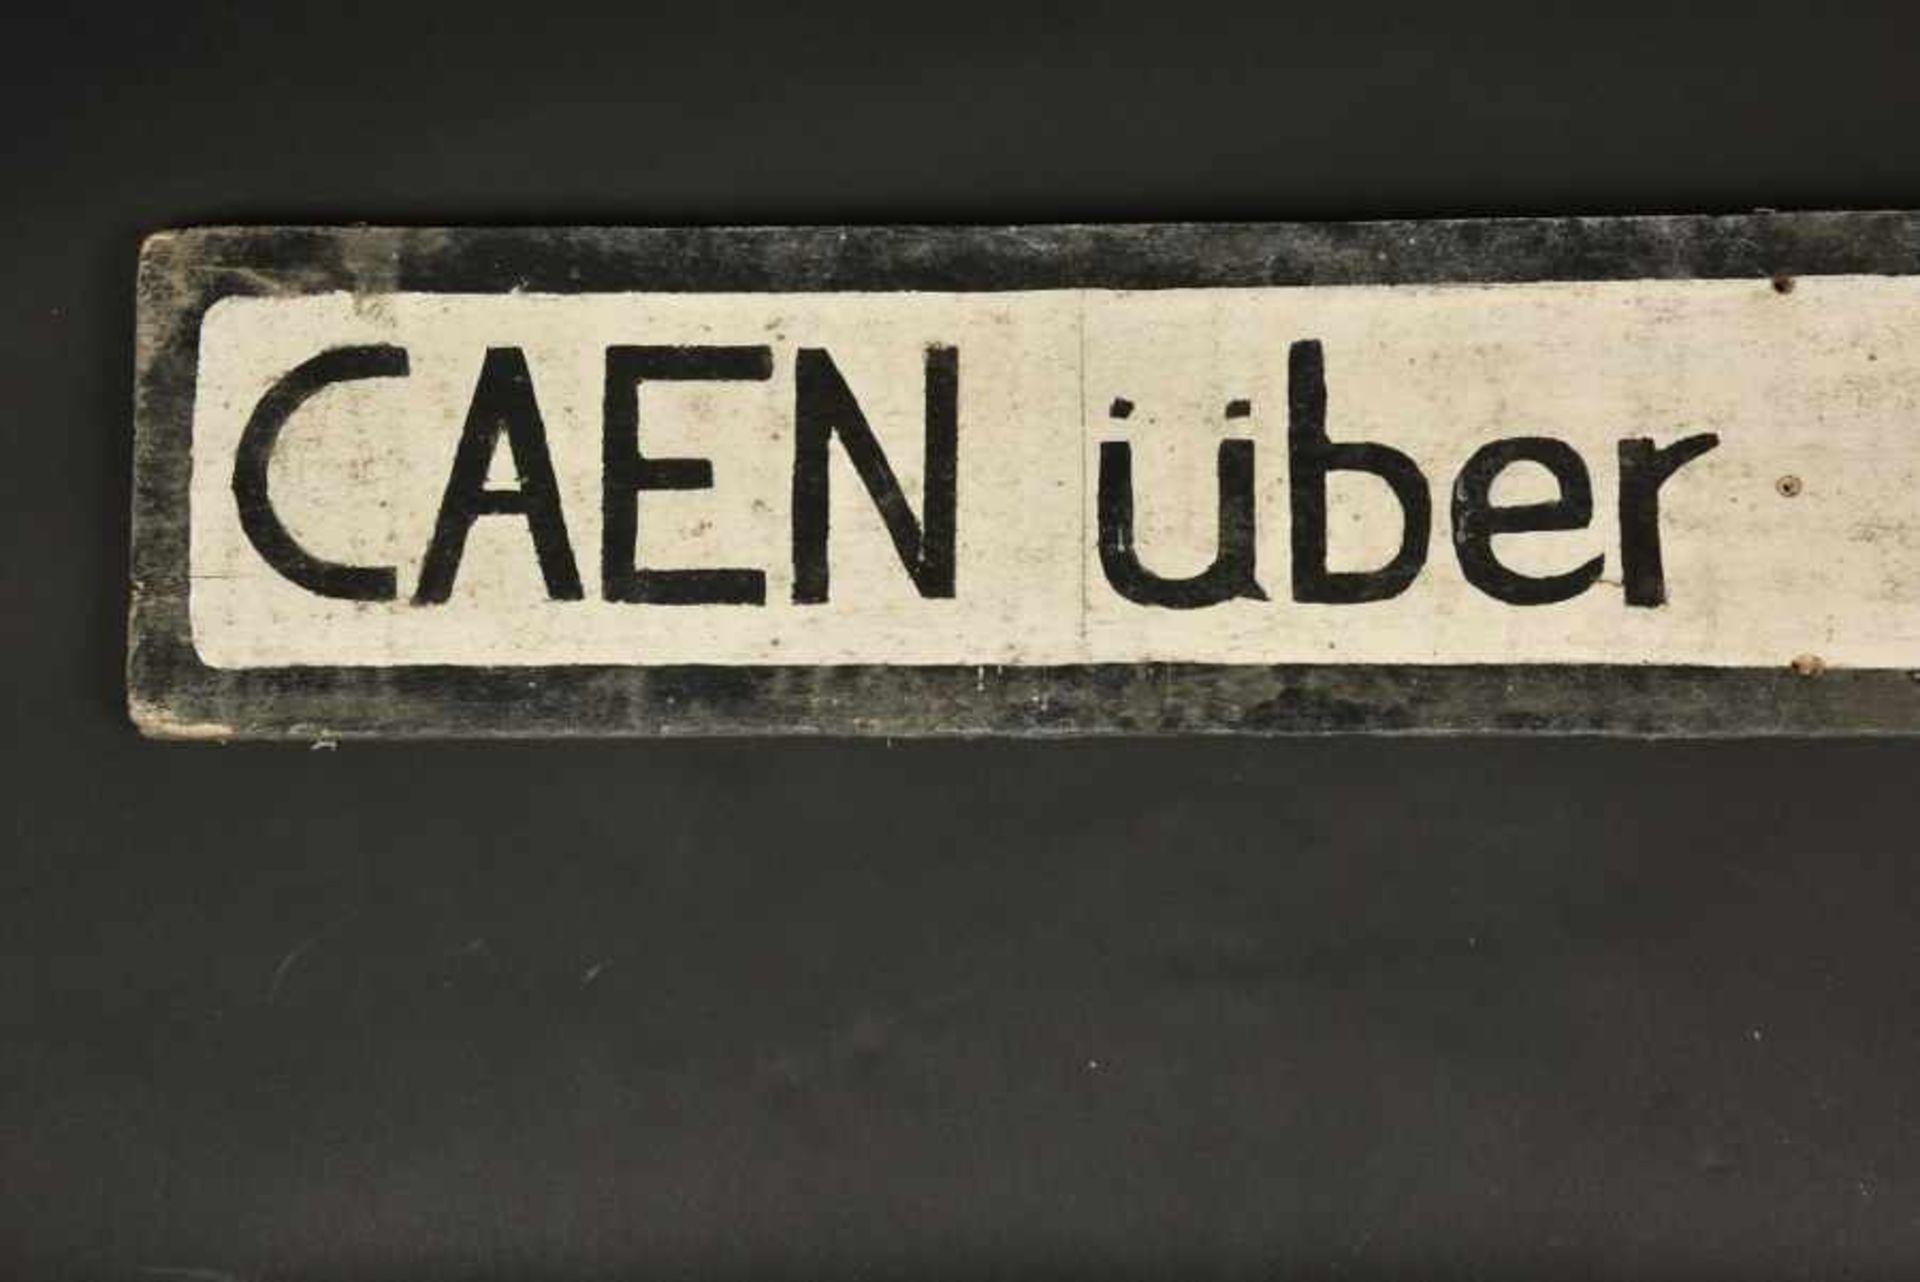 Panneau directionnel Caen über Bayeux. Directional sign Caen über Bayeux.En bois, fond peint en - Bild 3 aus 4